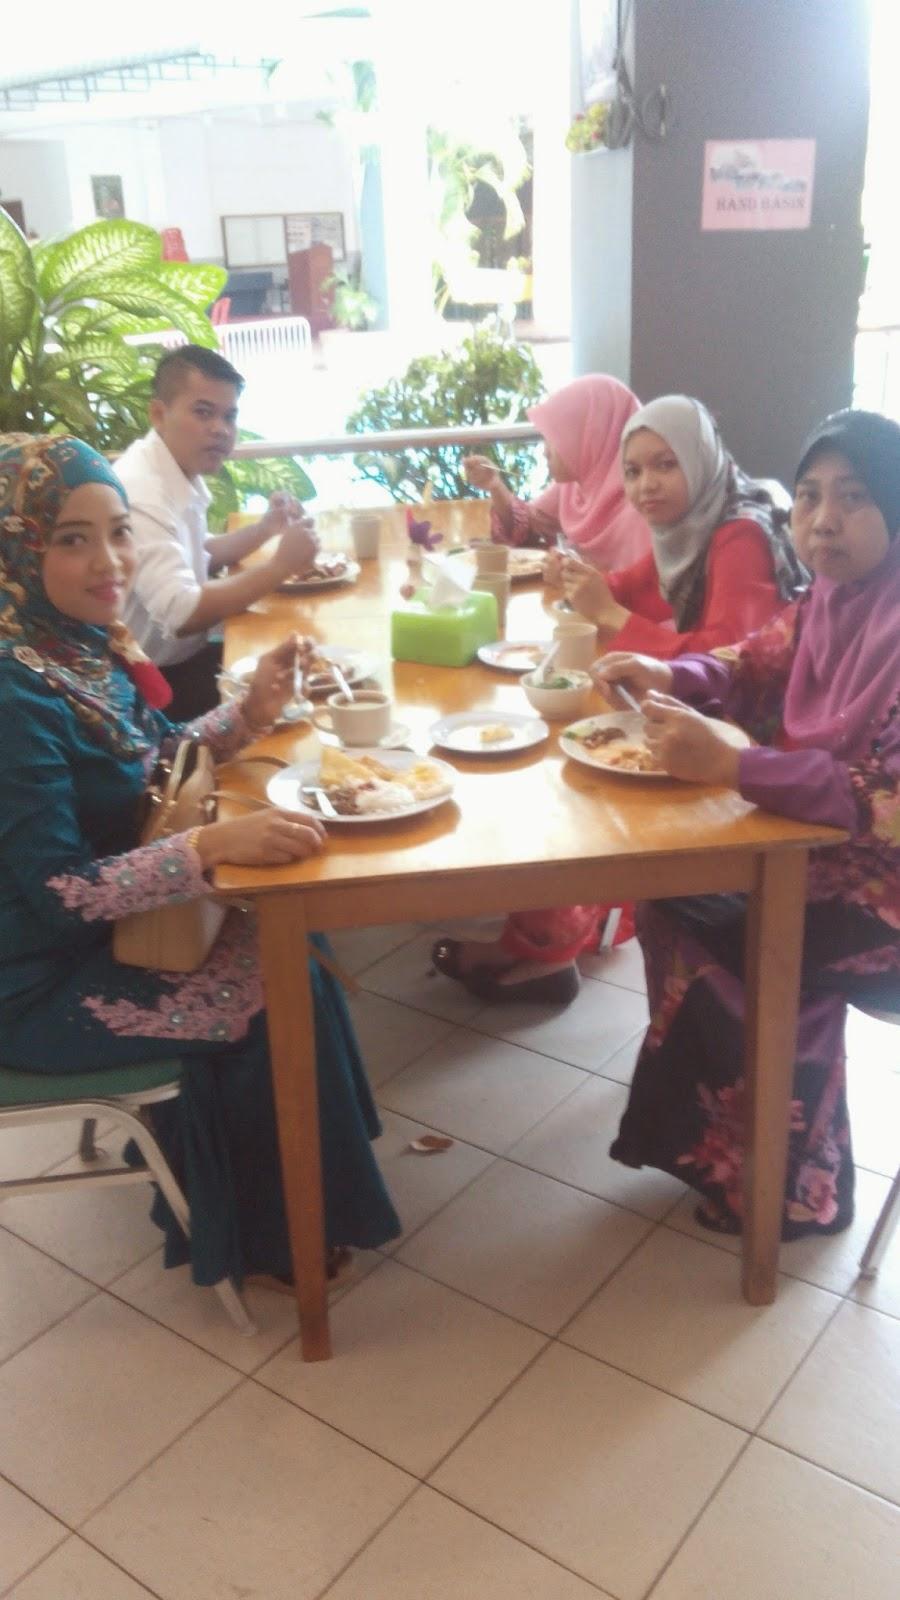 Marina cove resort teluk batik,marina cove resort berhantu ,selfie , blogger lyana rohazi, travel blogger